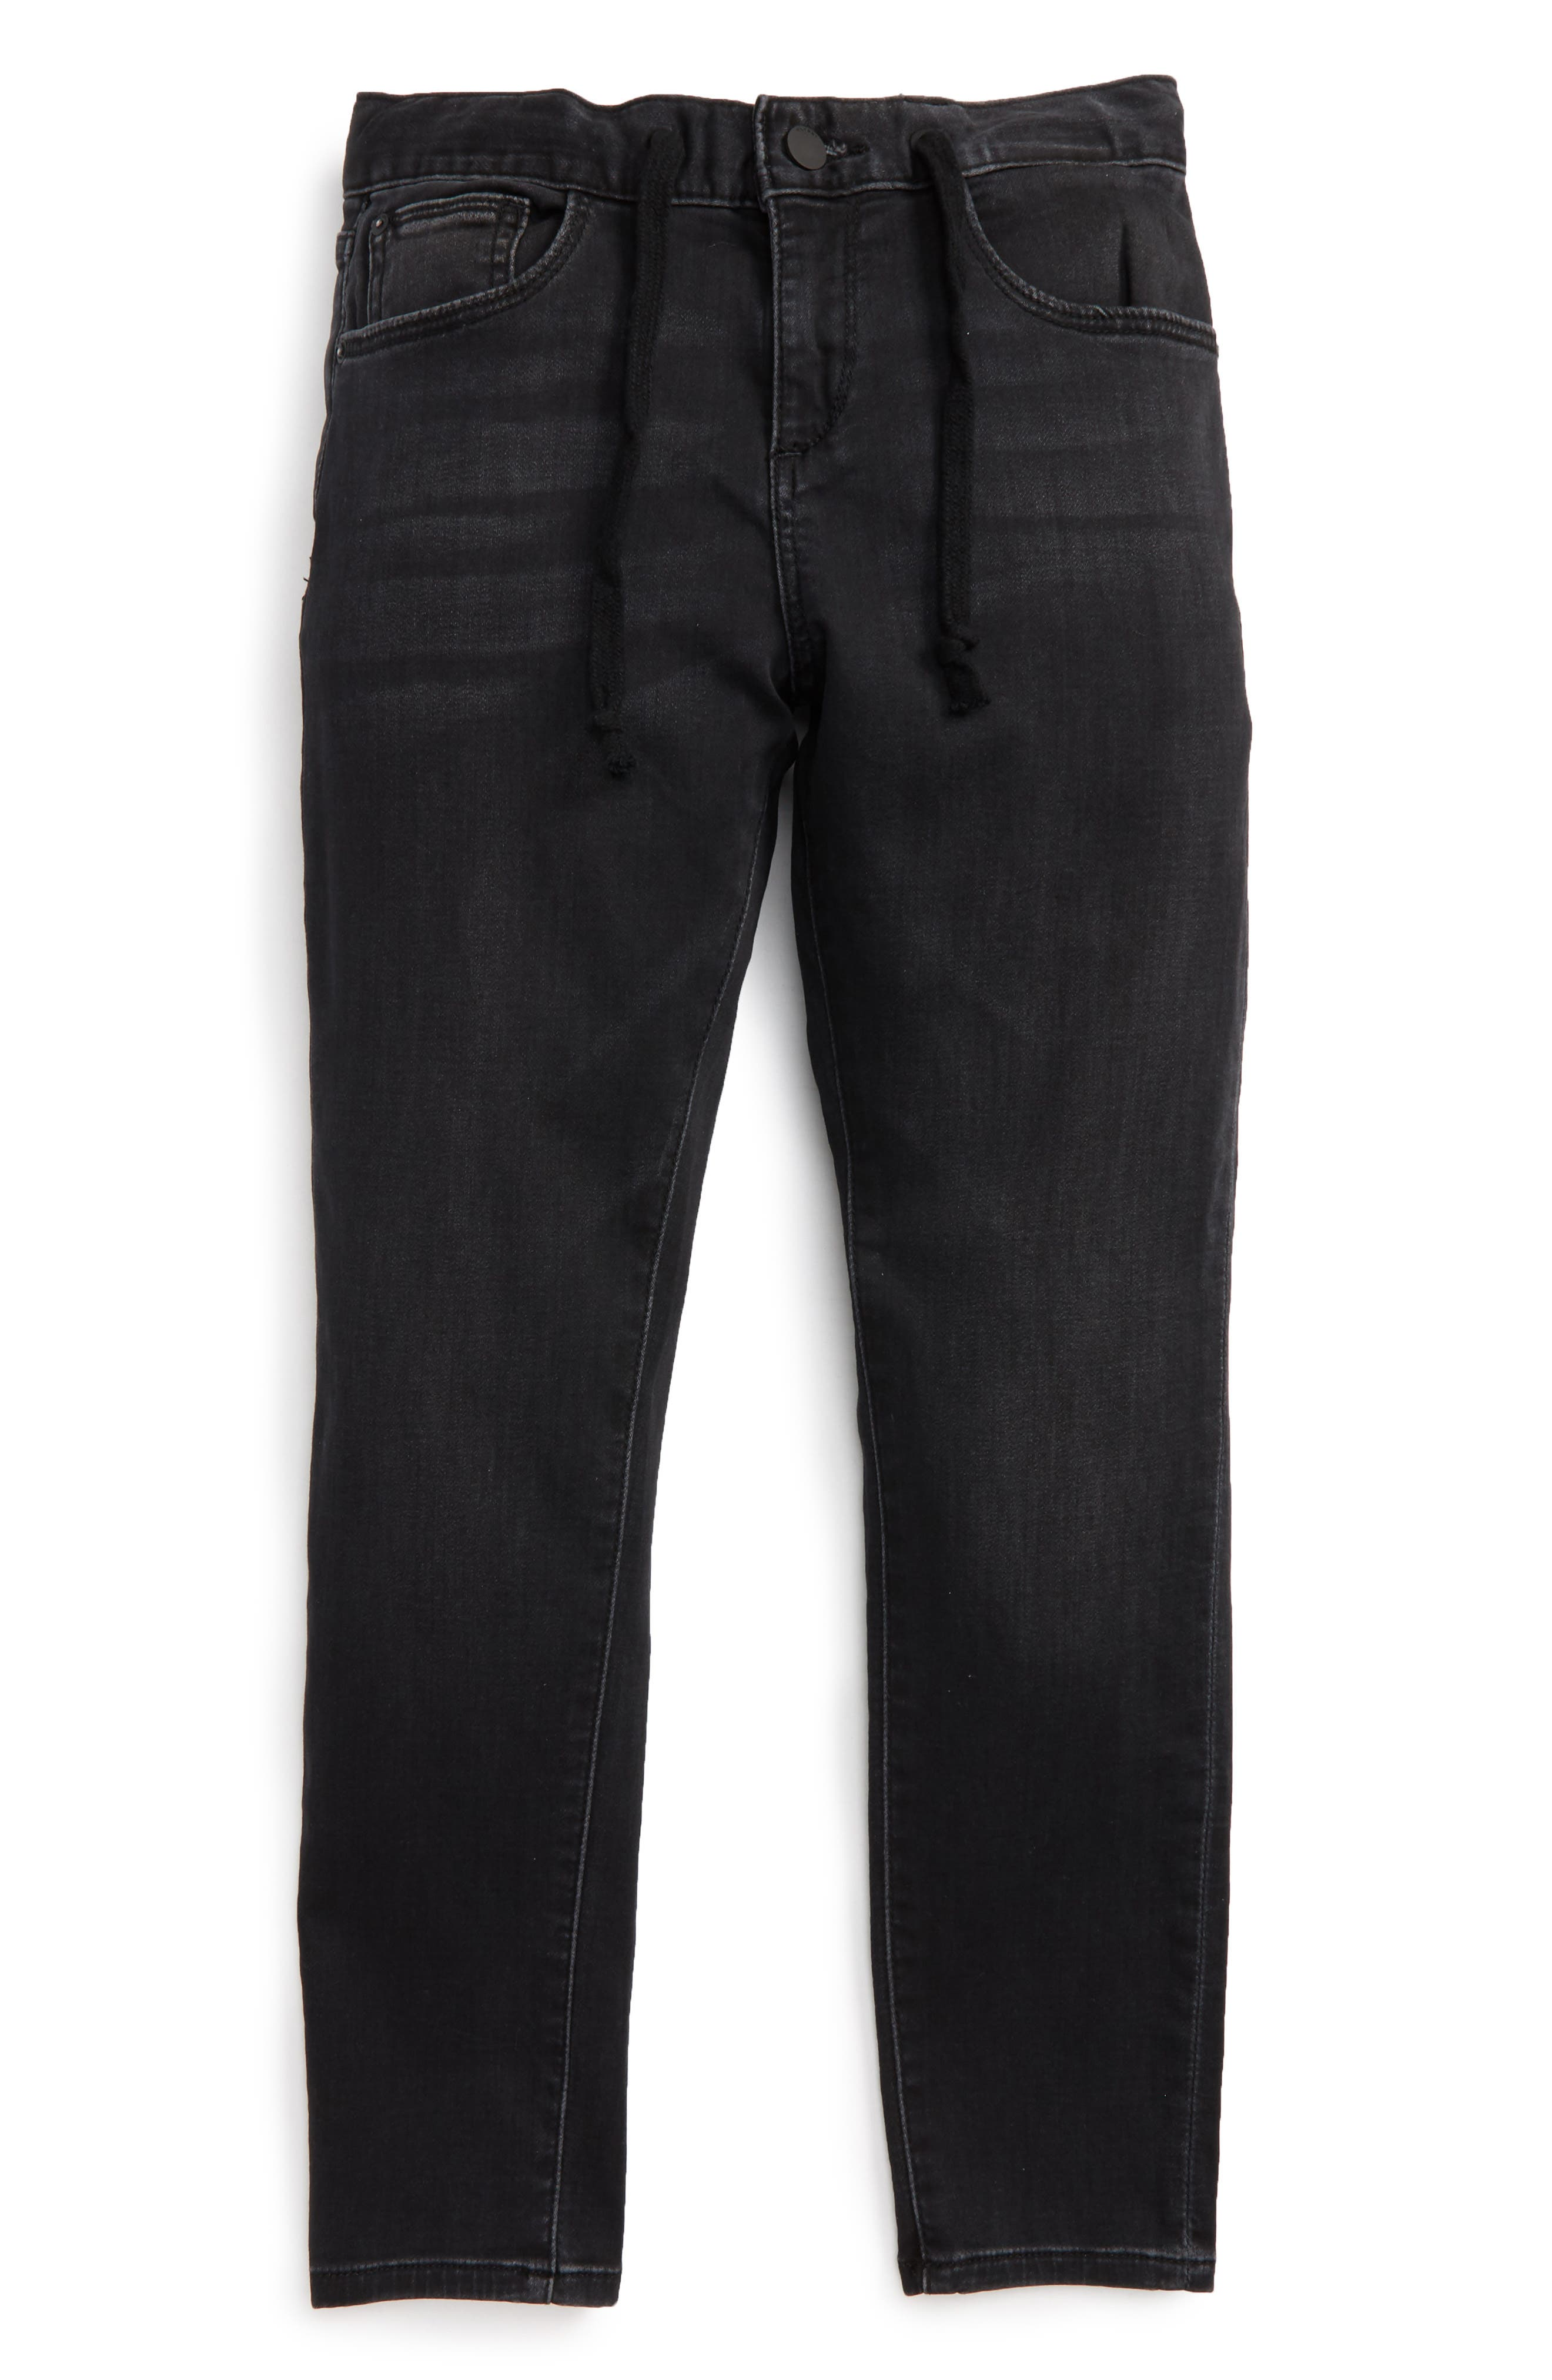 DL1961 William Straight Leg Jeans (Big Boys)